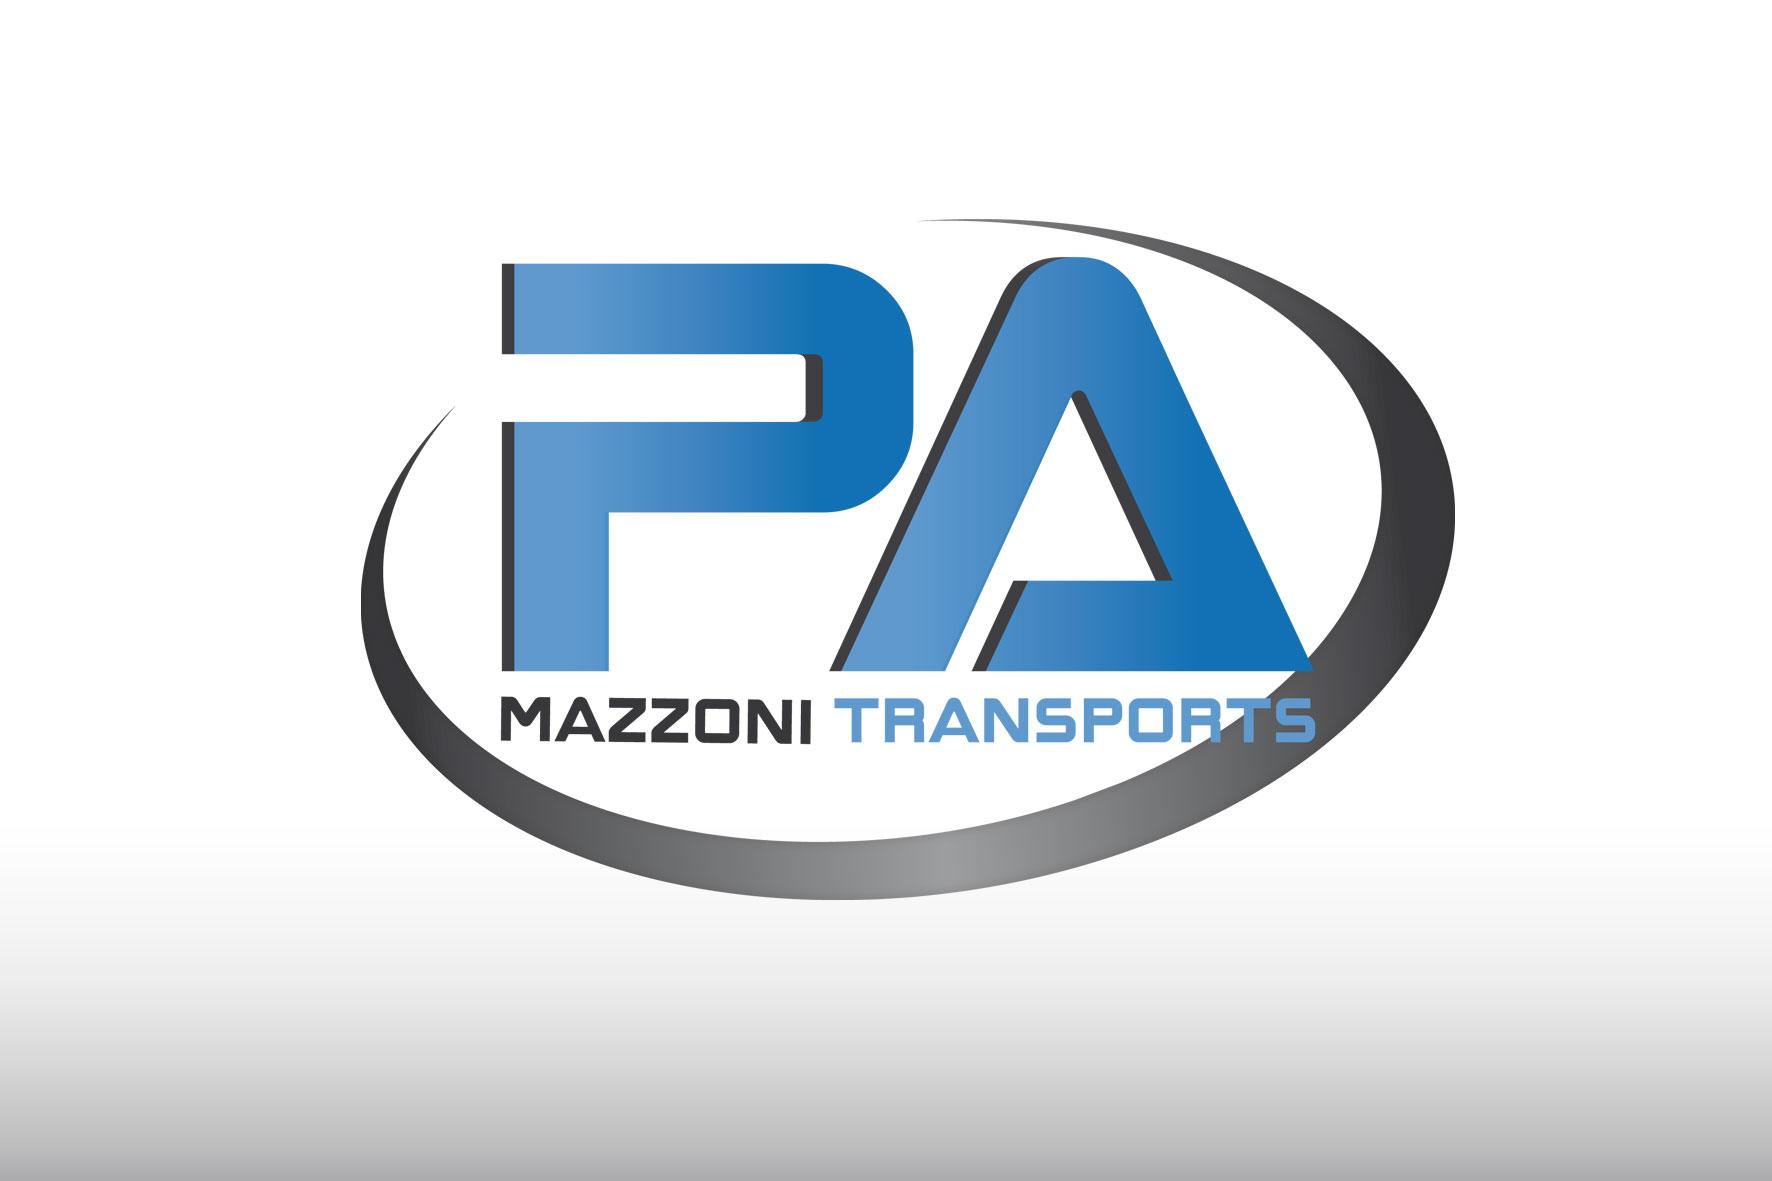 Mazzoni Transports